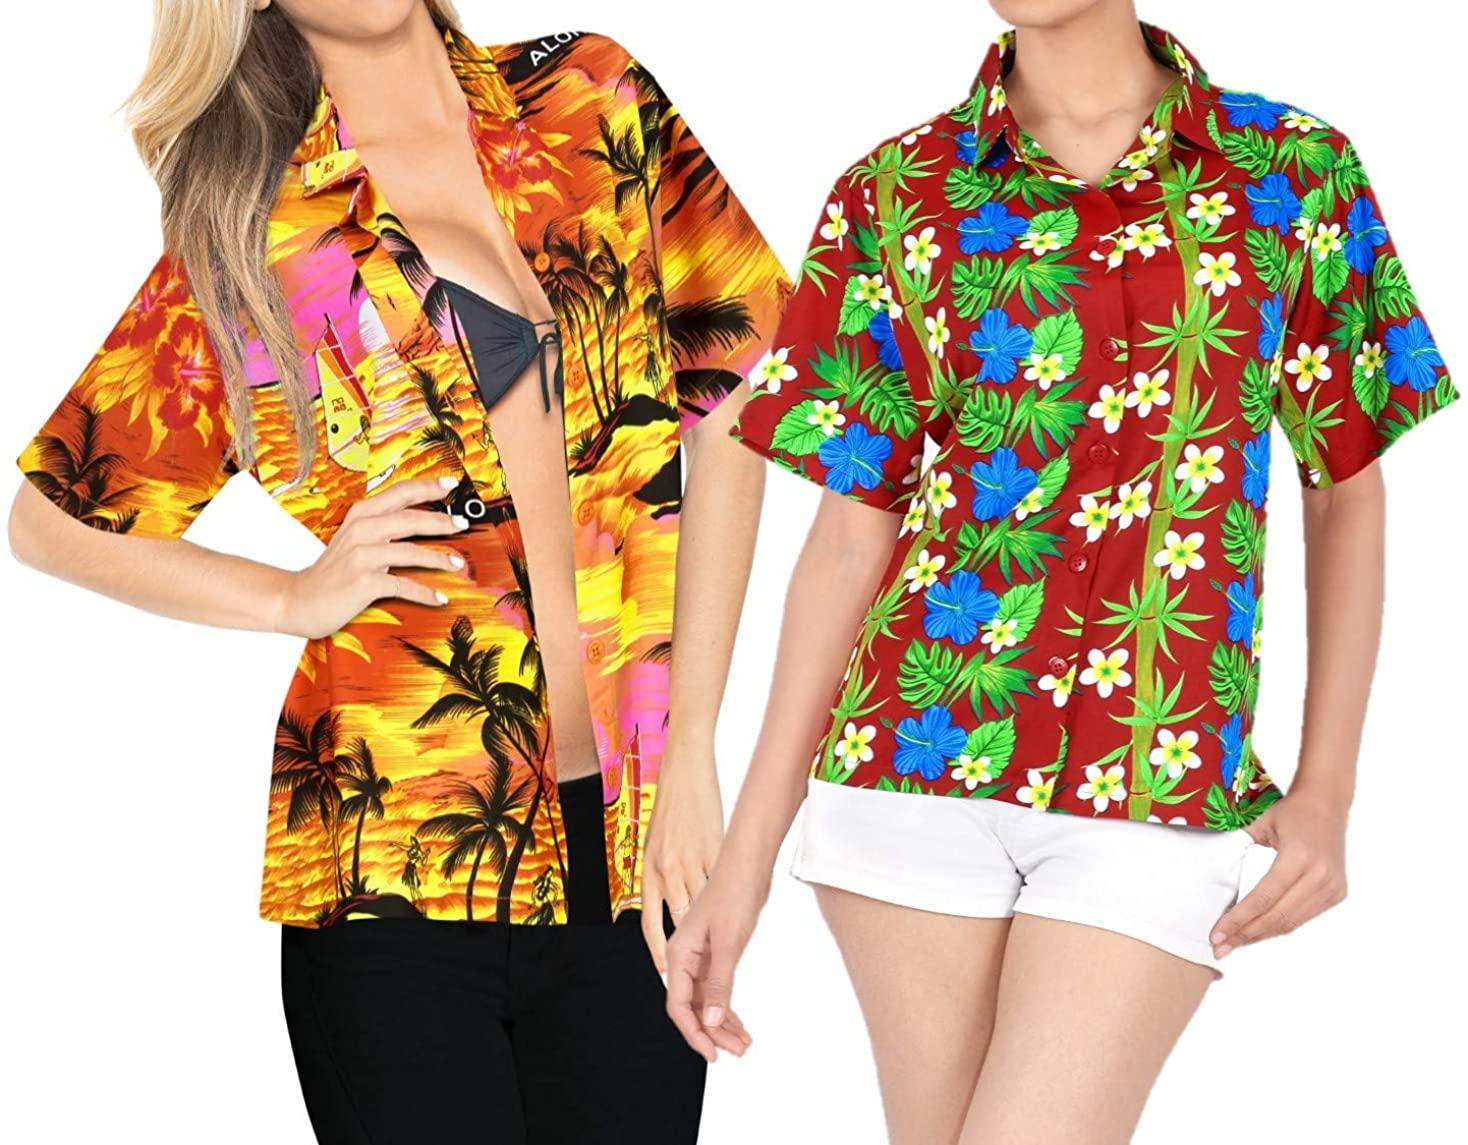 LA LEELA Women's Plus Size Hawaiian Shirt Swim Short Sleeves Loose Fit Work from Home Clothes Women Beach Shirt Blouse Shirt Combo Pack of 2 Size S